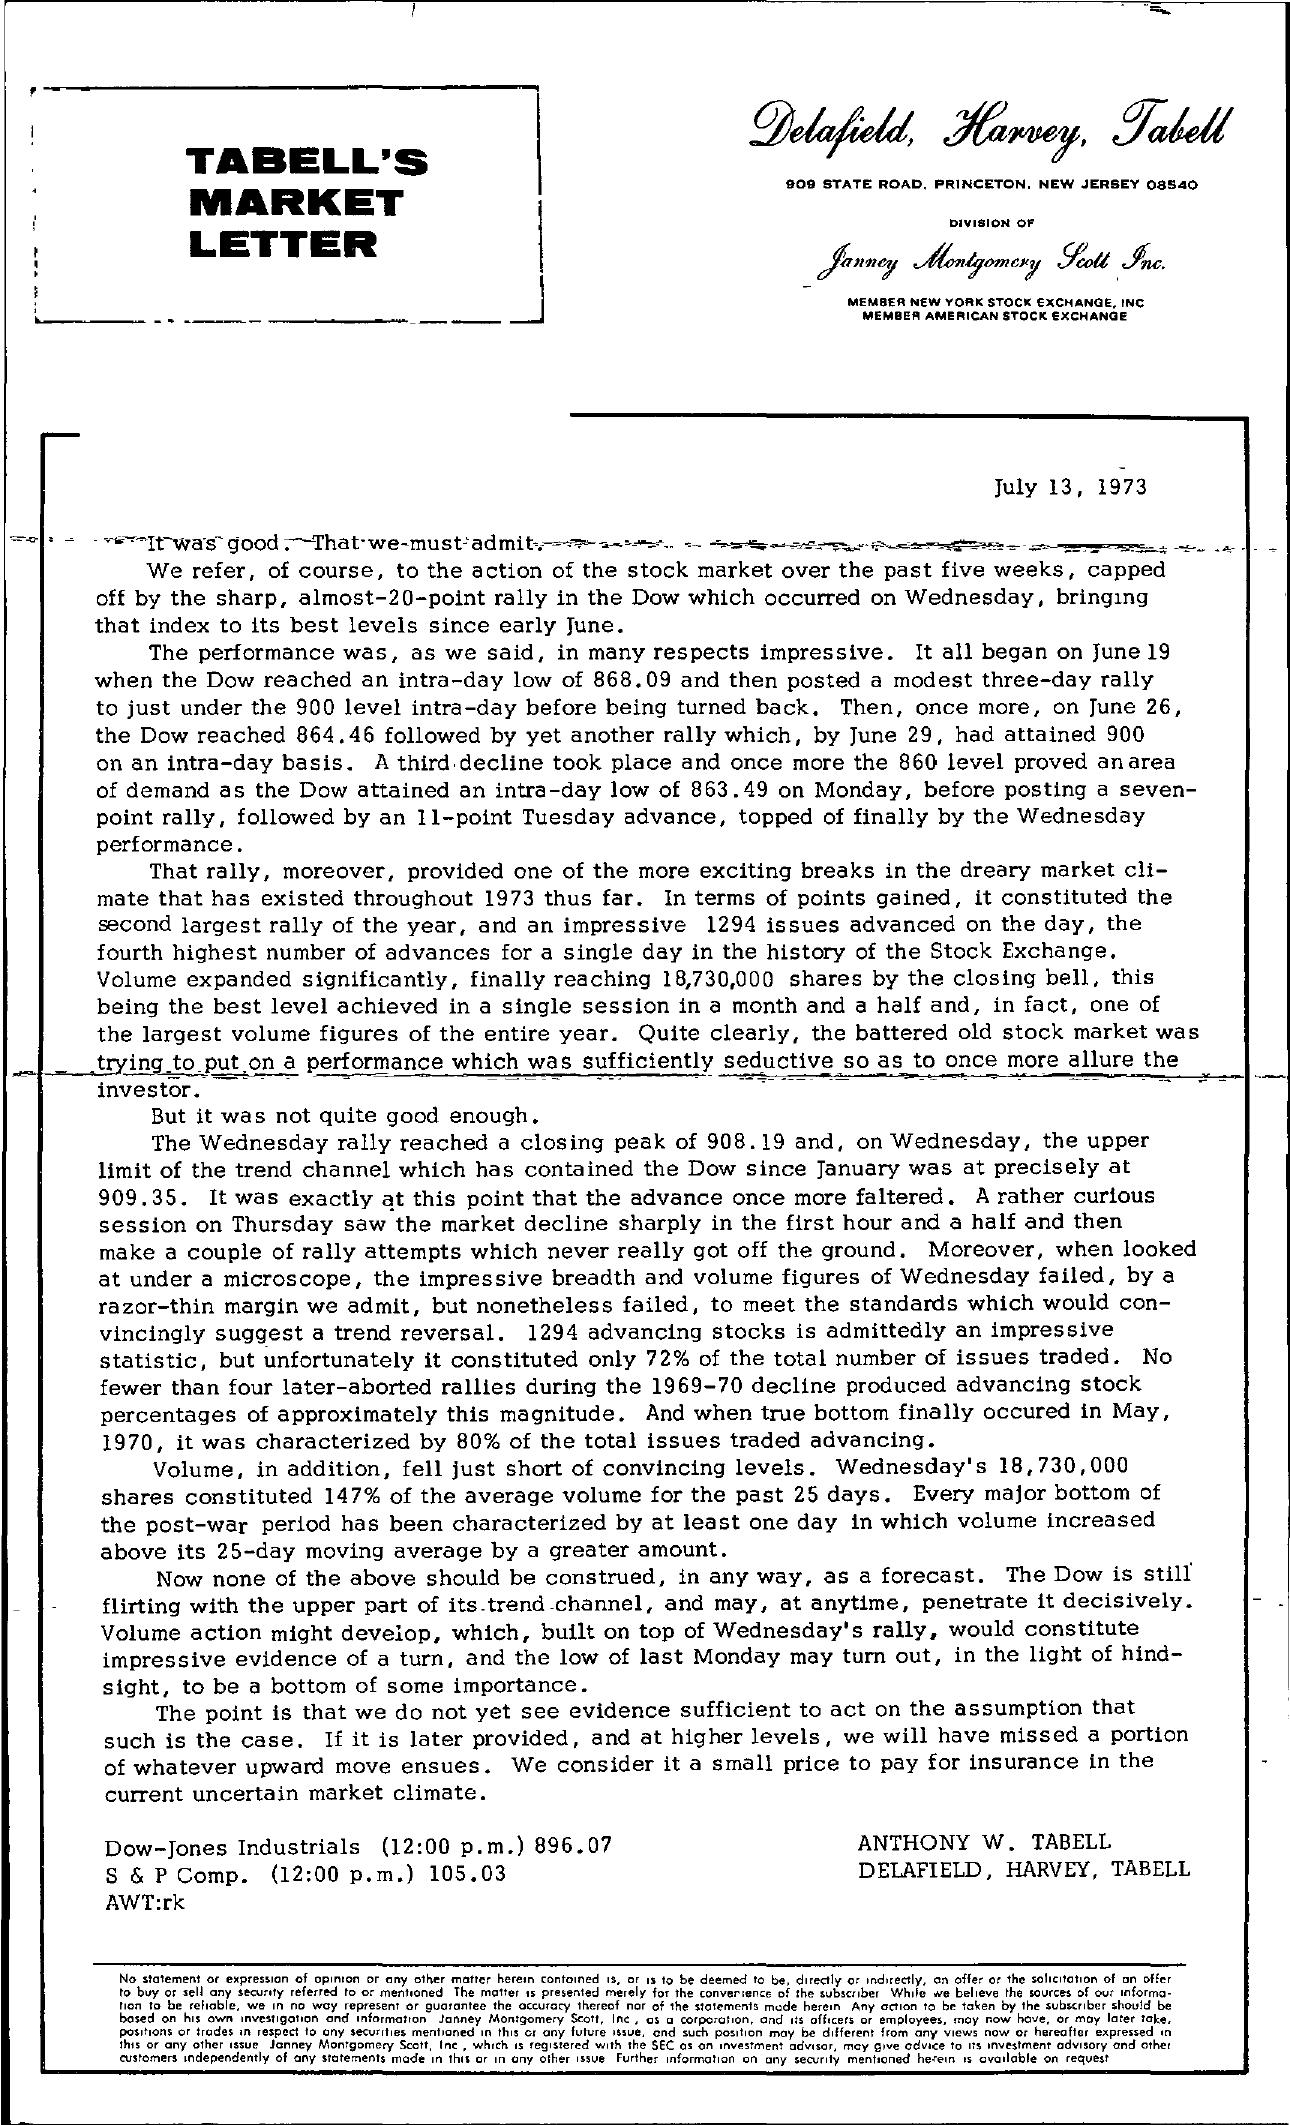 Tabell's Market Letter - July 13, 1973